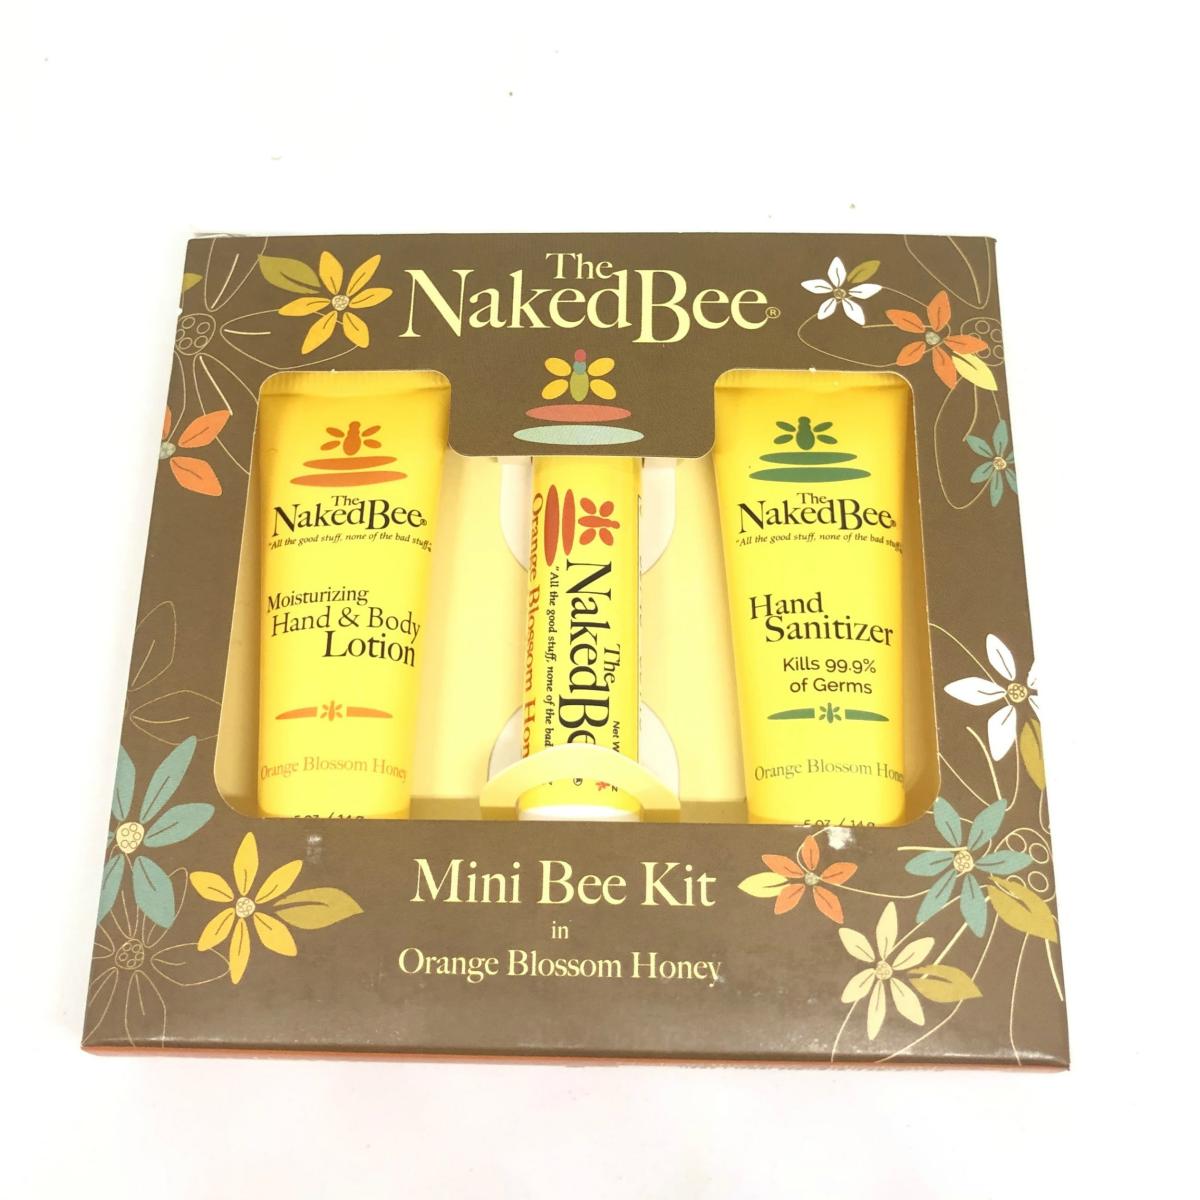 The Naked Bee Mini Bee Kit-Orange Blossom